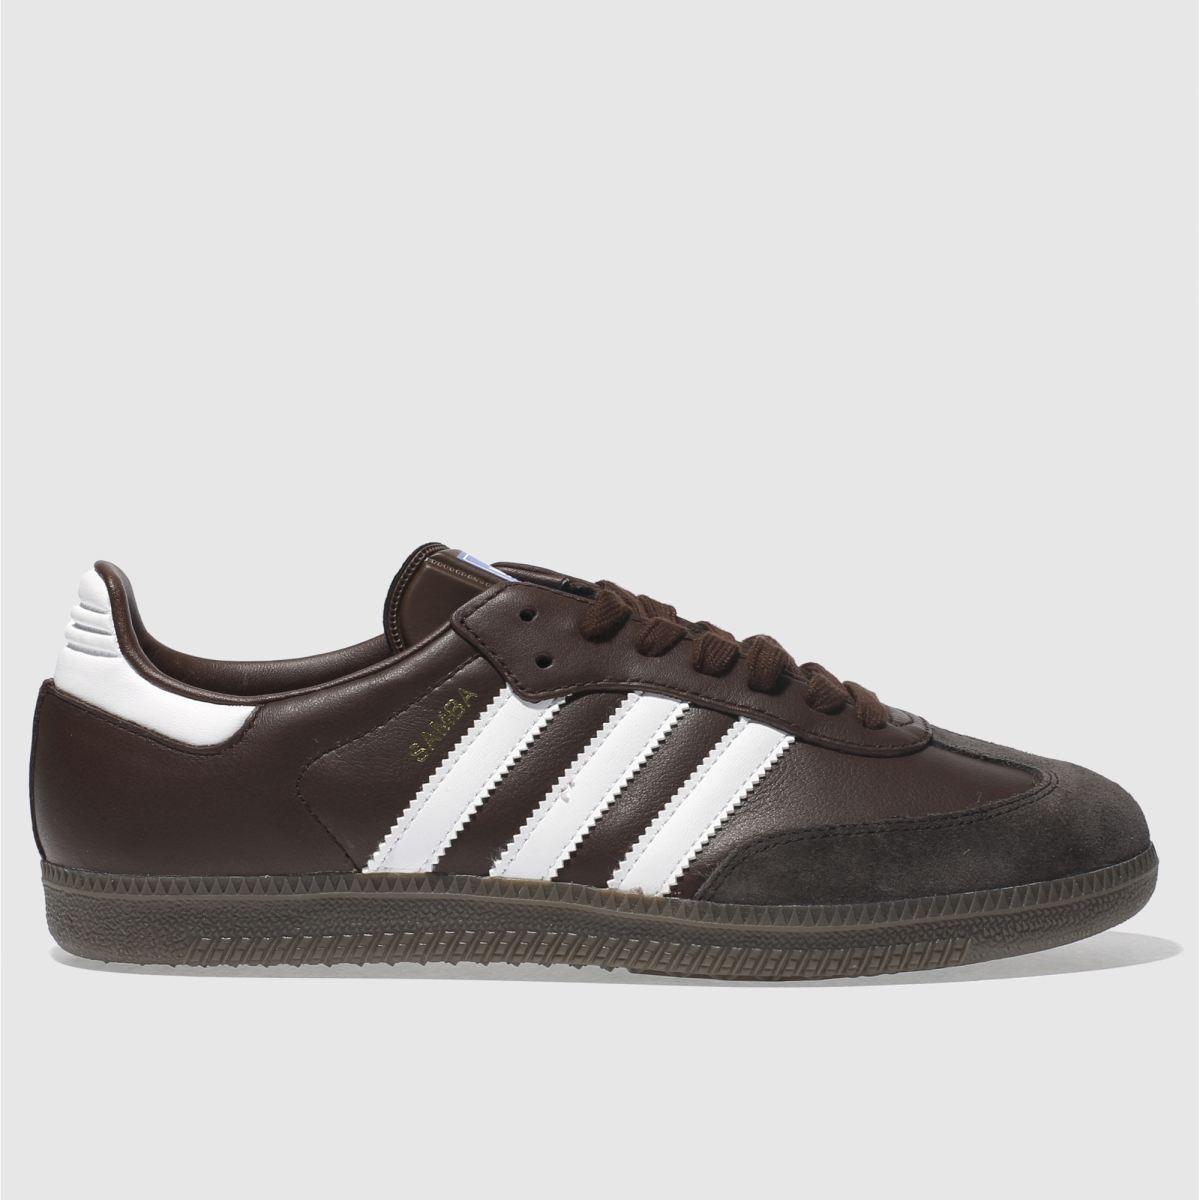 Adidas Dark Brown Samba Og Trainers